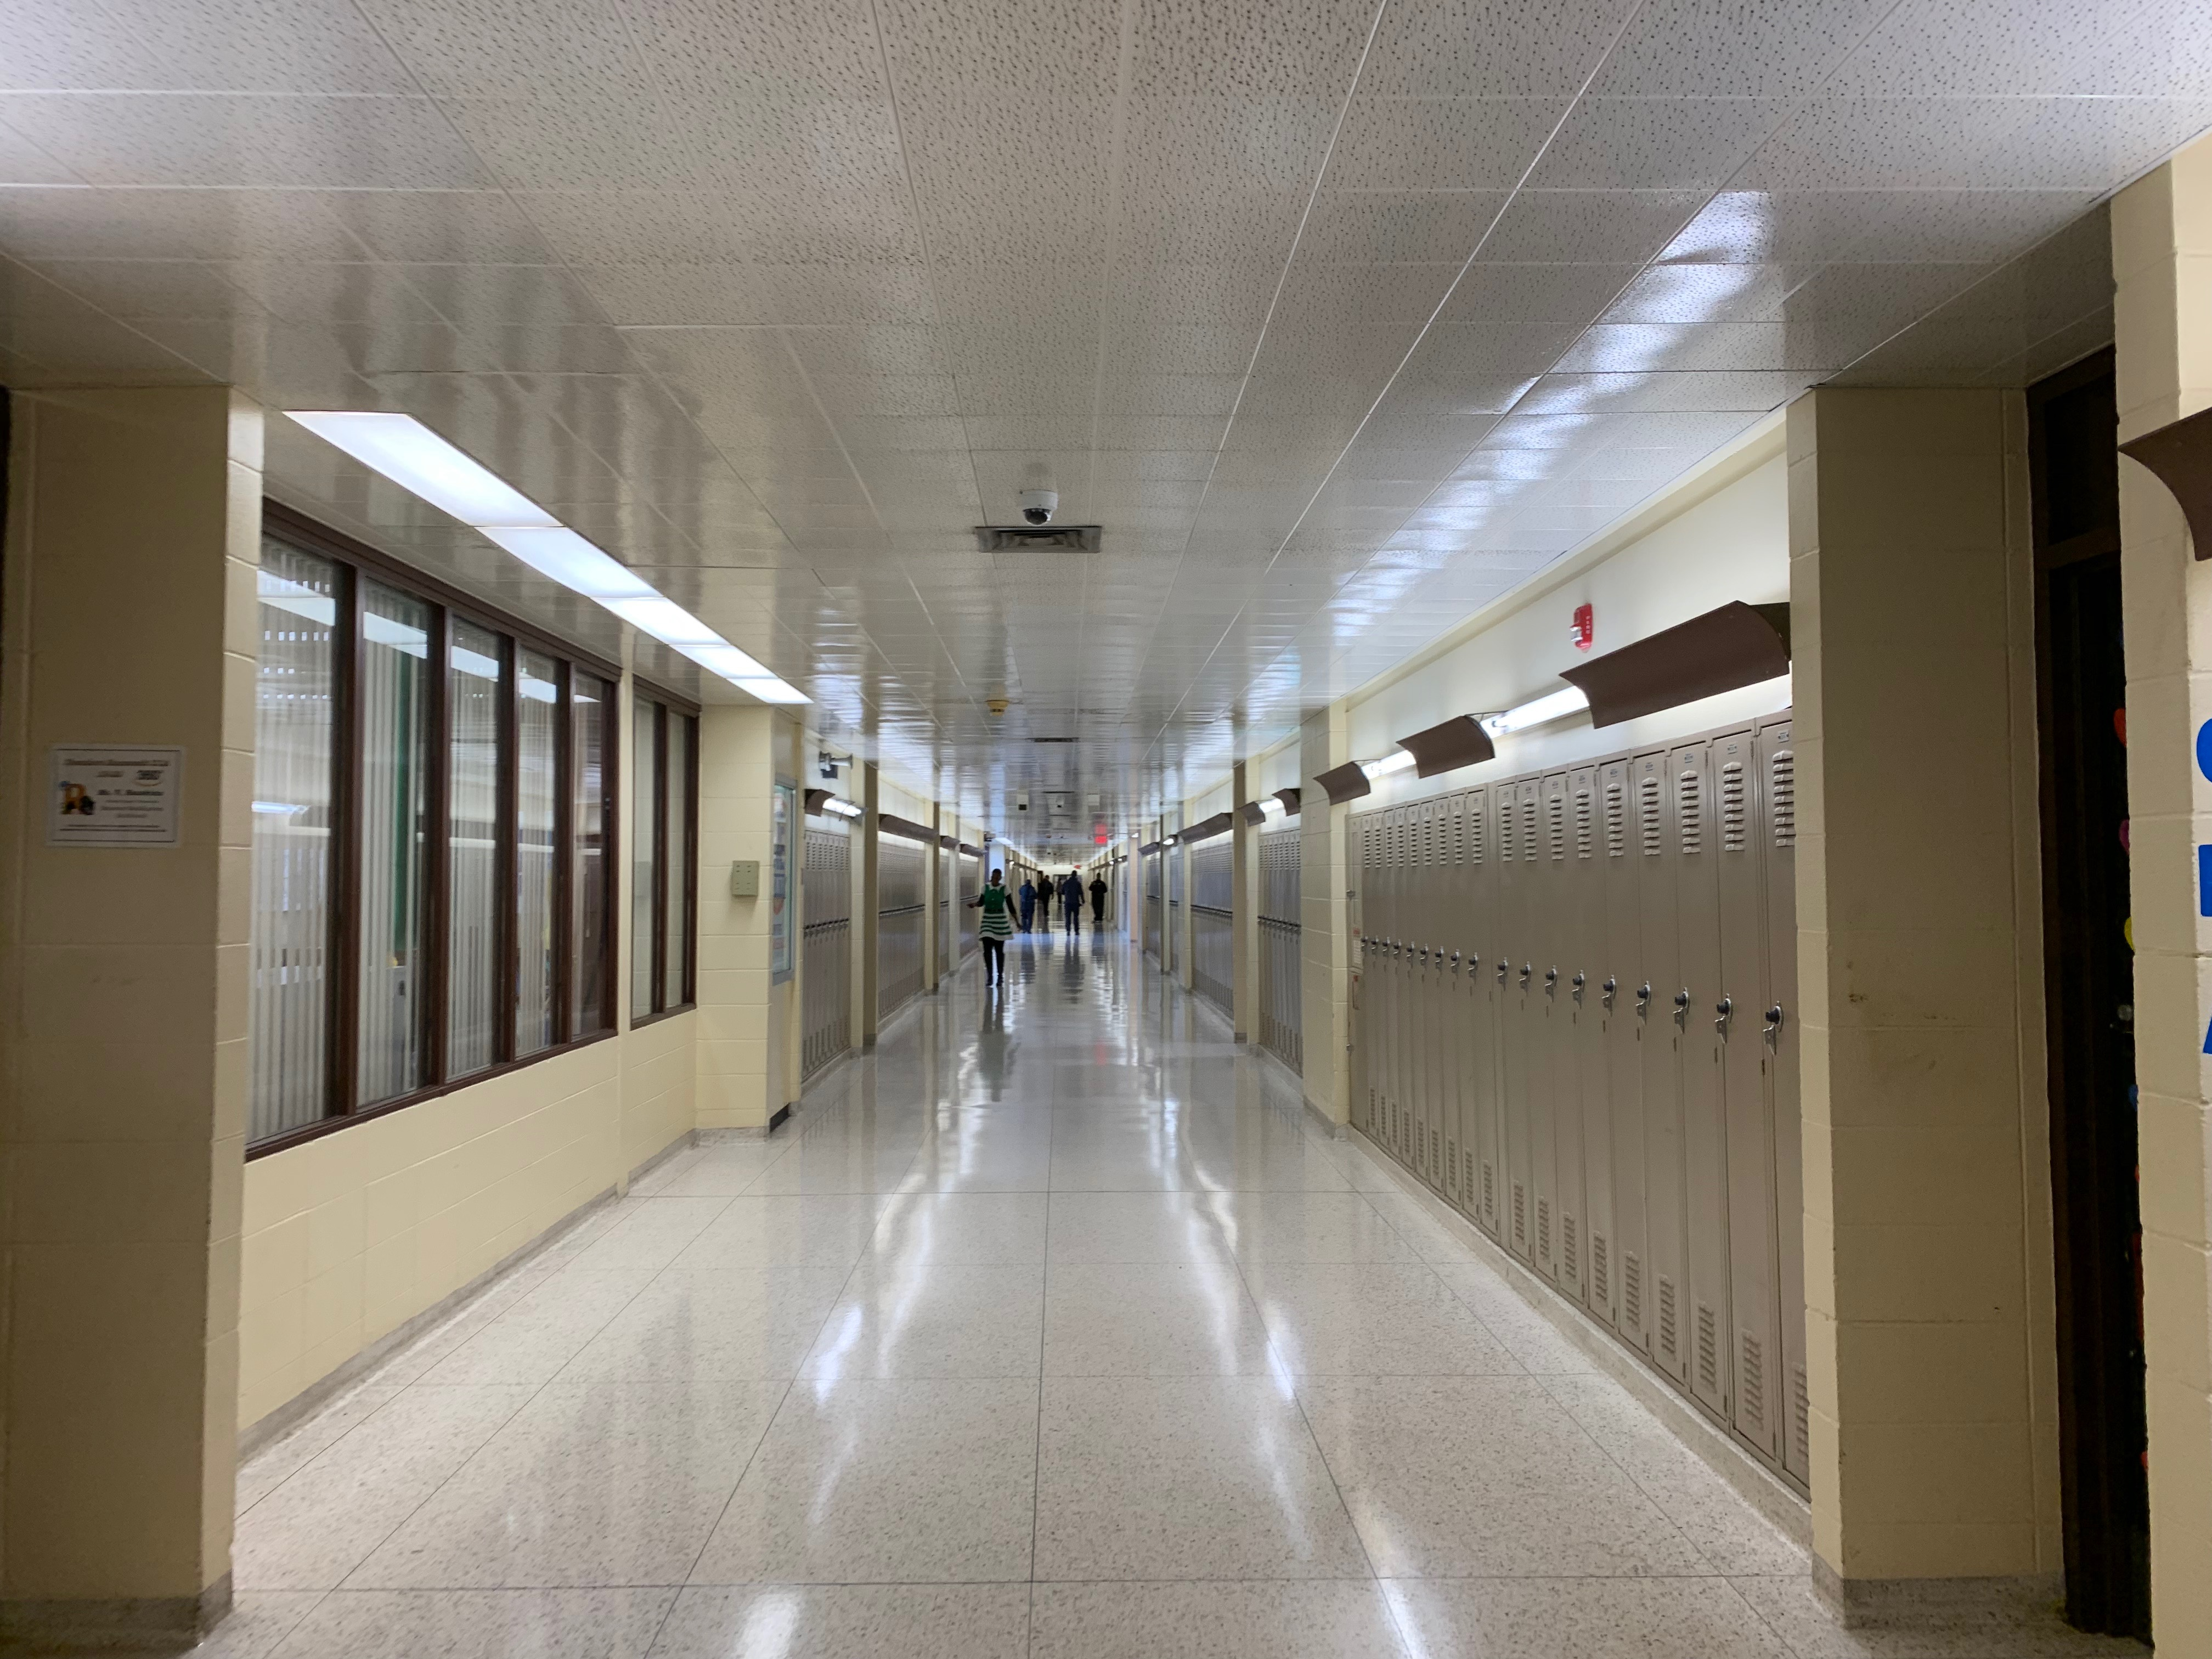 A long, empty hallway in Gary Area Career Center.